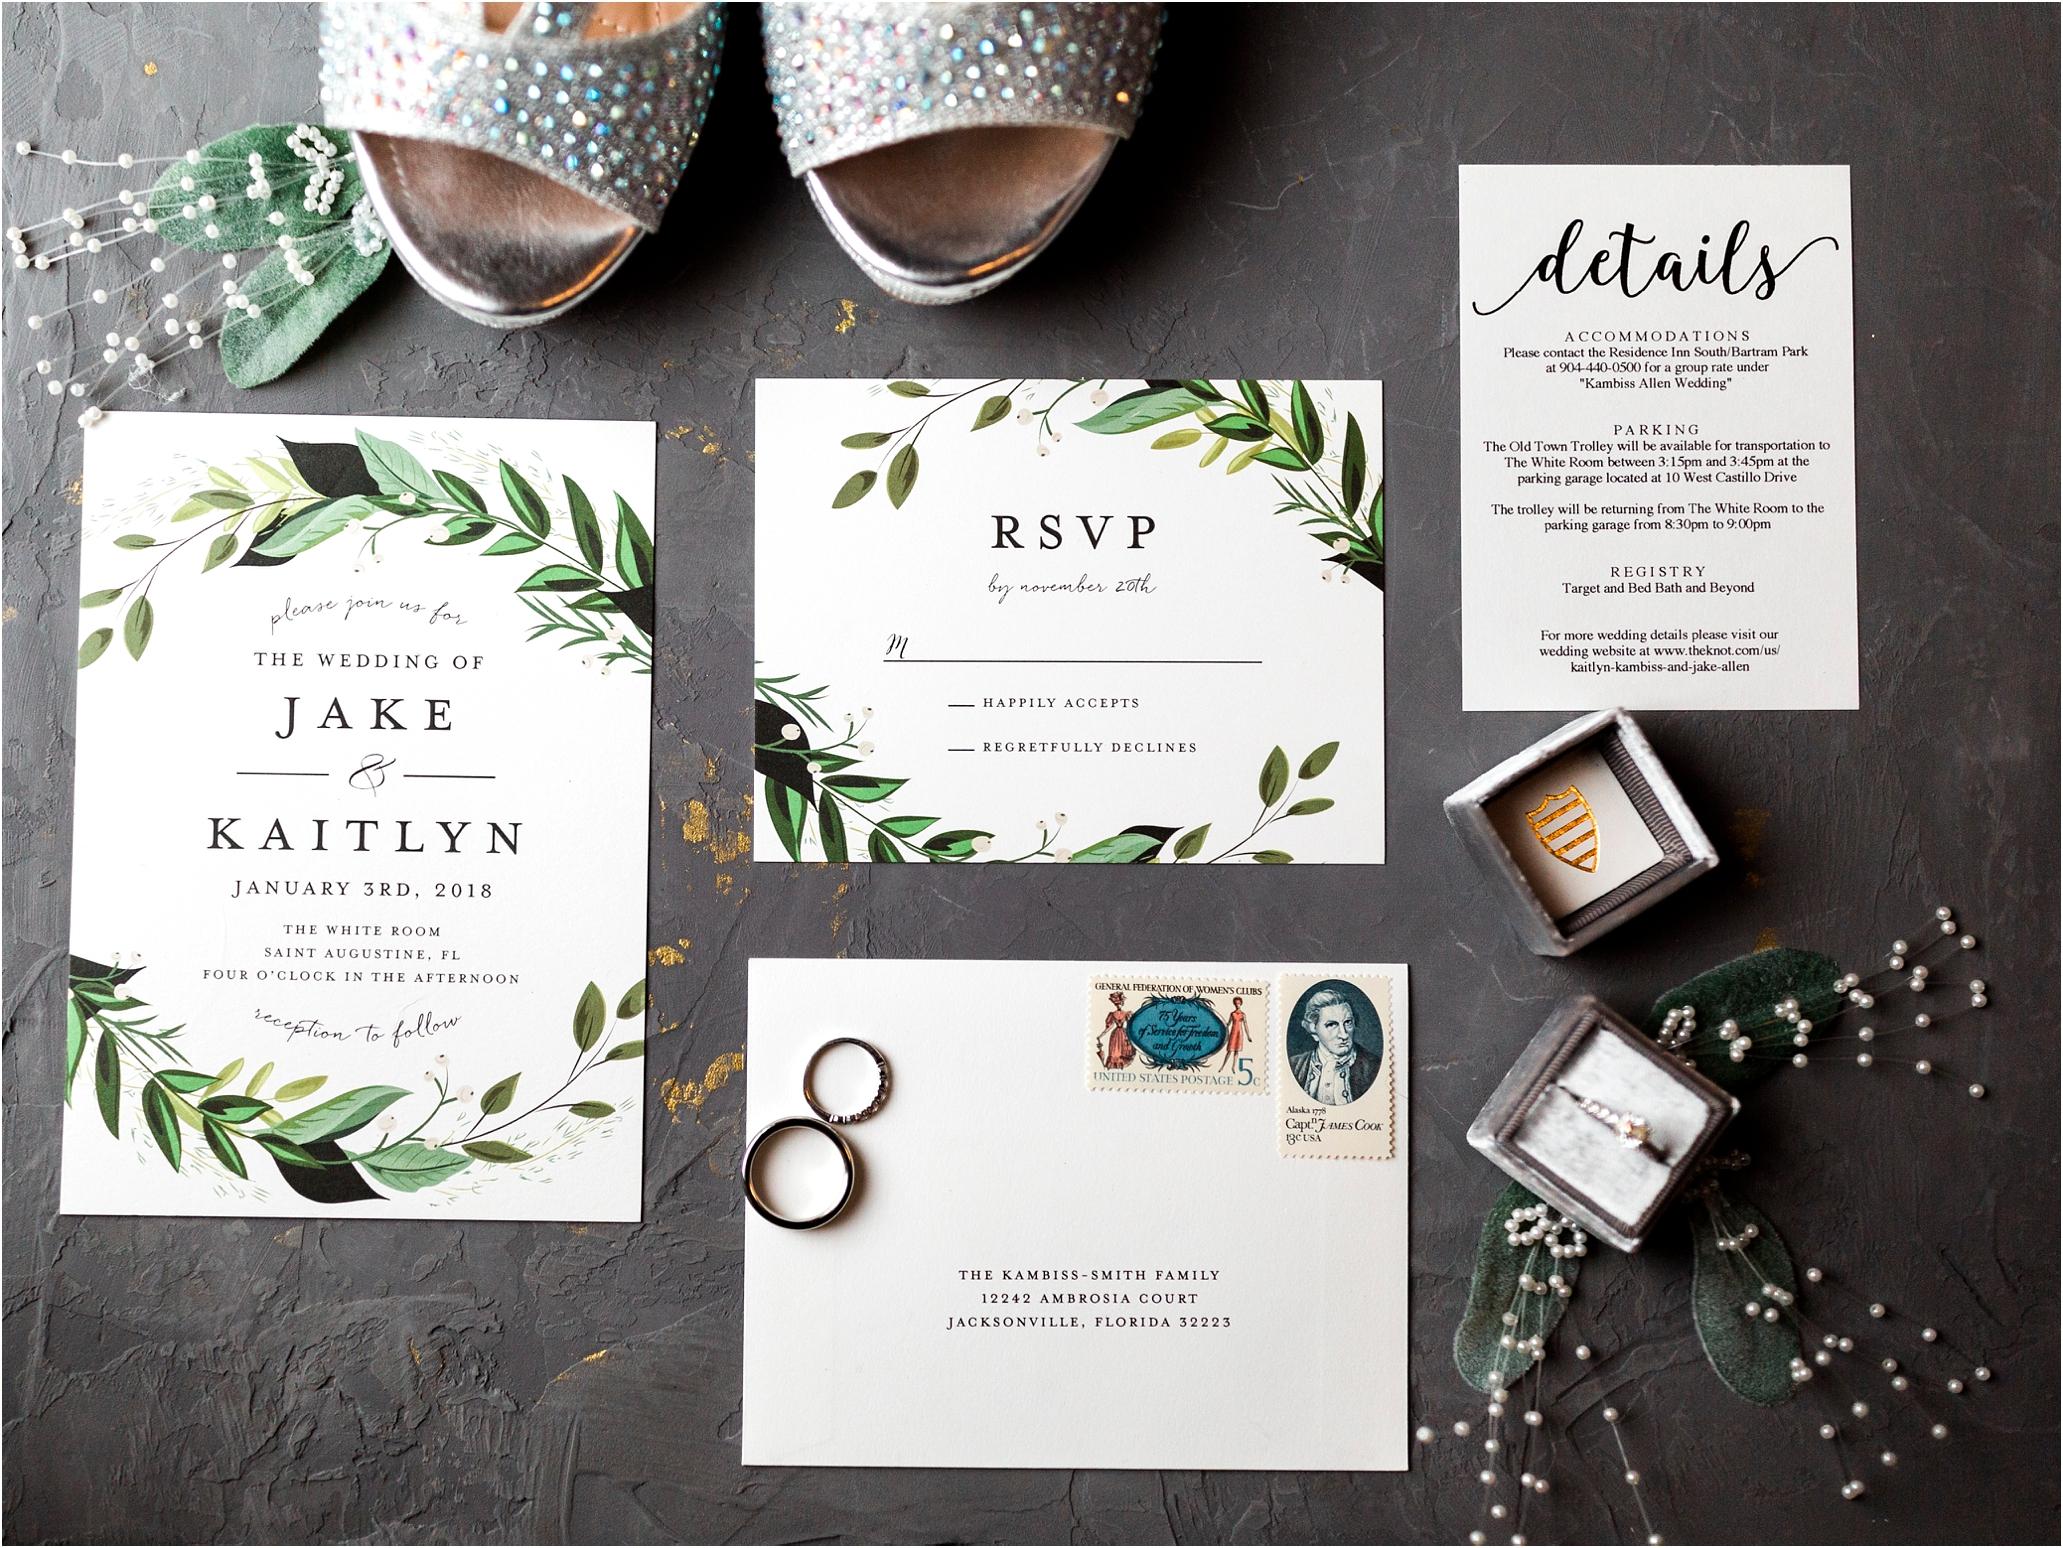 Lisa Silva Photography- Ponte Vedra Beach and Jacksonville, Florida Fine Art Film Wedding Photography- Wedding at The White Room Villa Blanca in St. Augustine, Florida_0001.jpg